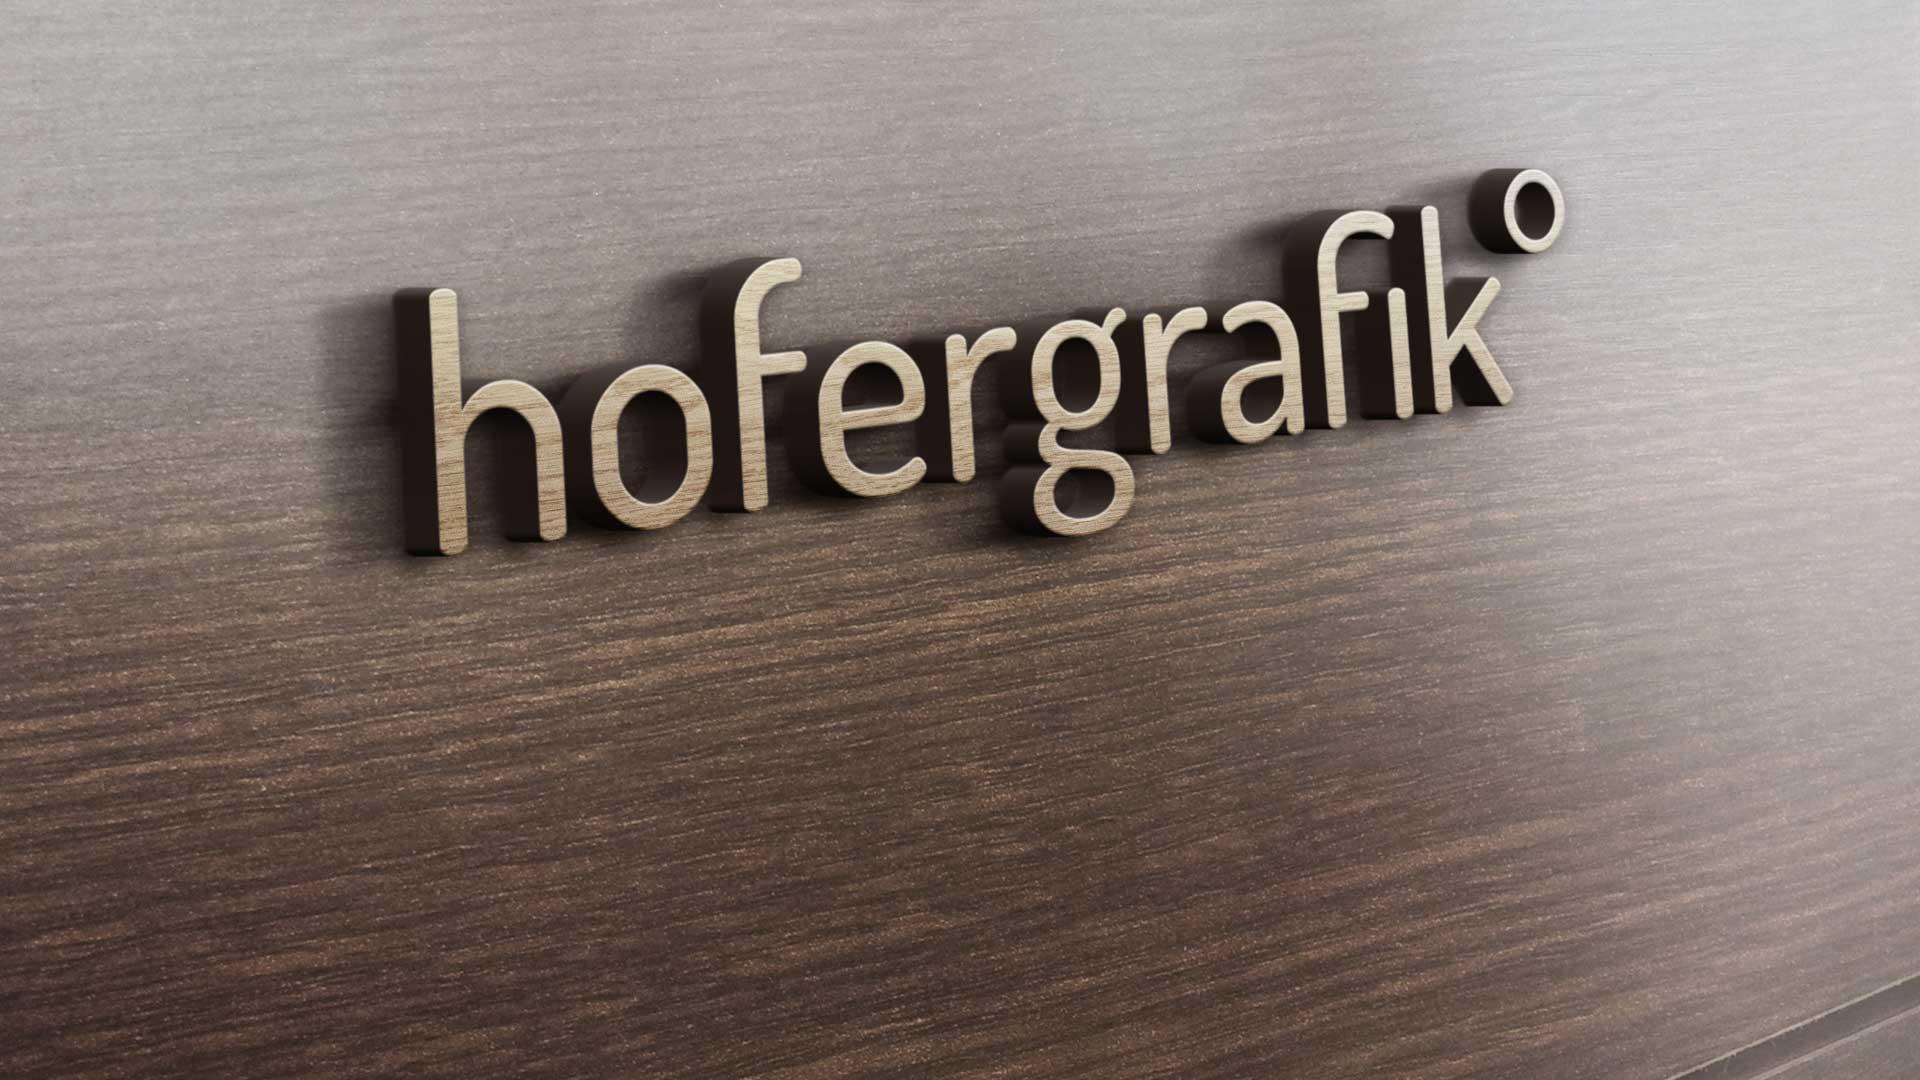 hofergrafik wooden sign